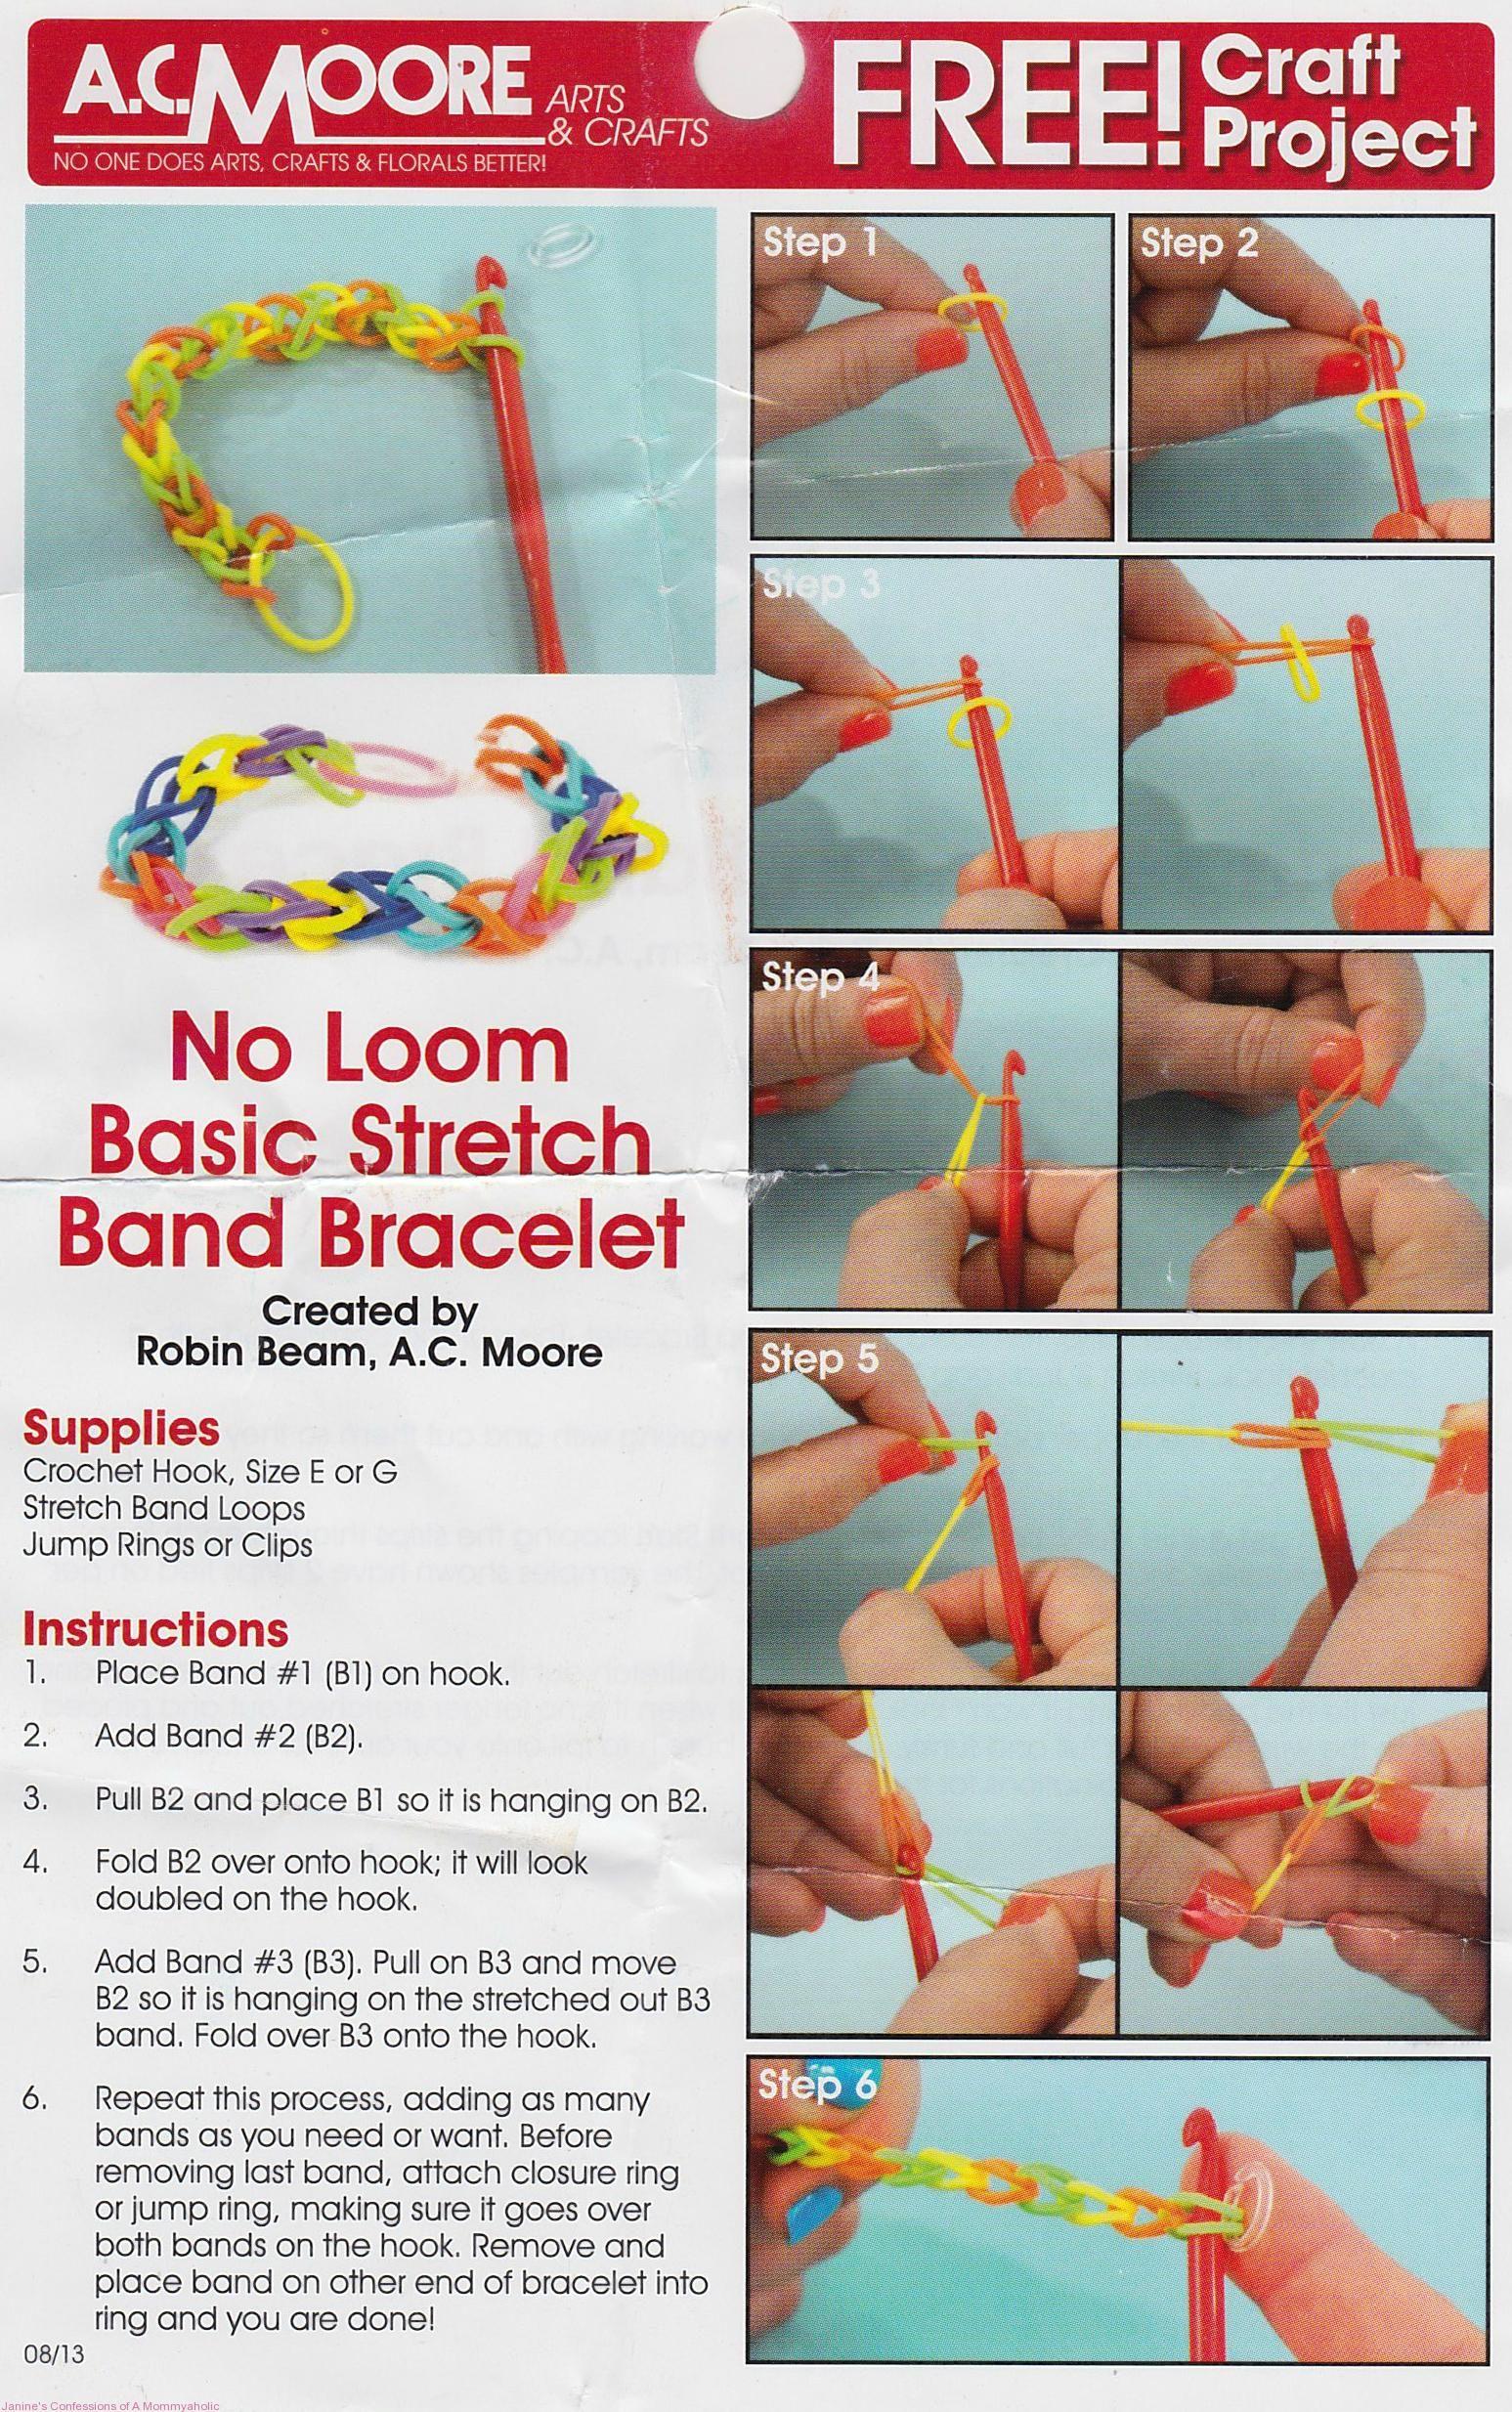 Ac Moore's Rubber Band Bracelet Tutorial Flyer